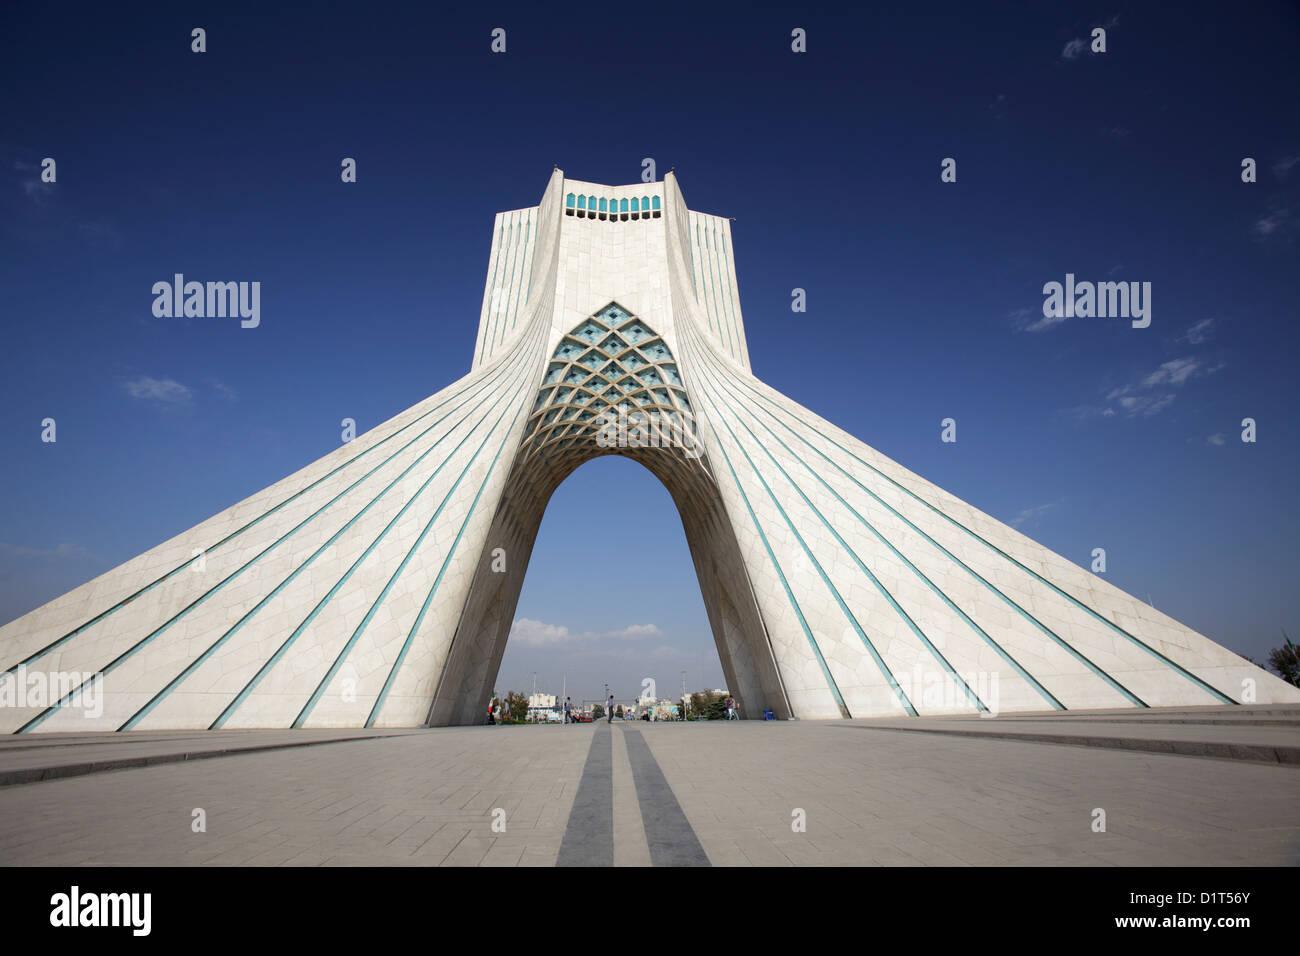 La torre Azadi, rey o Torre Memorial, Teherán, Irán Imagen De Stock